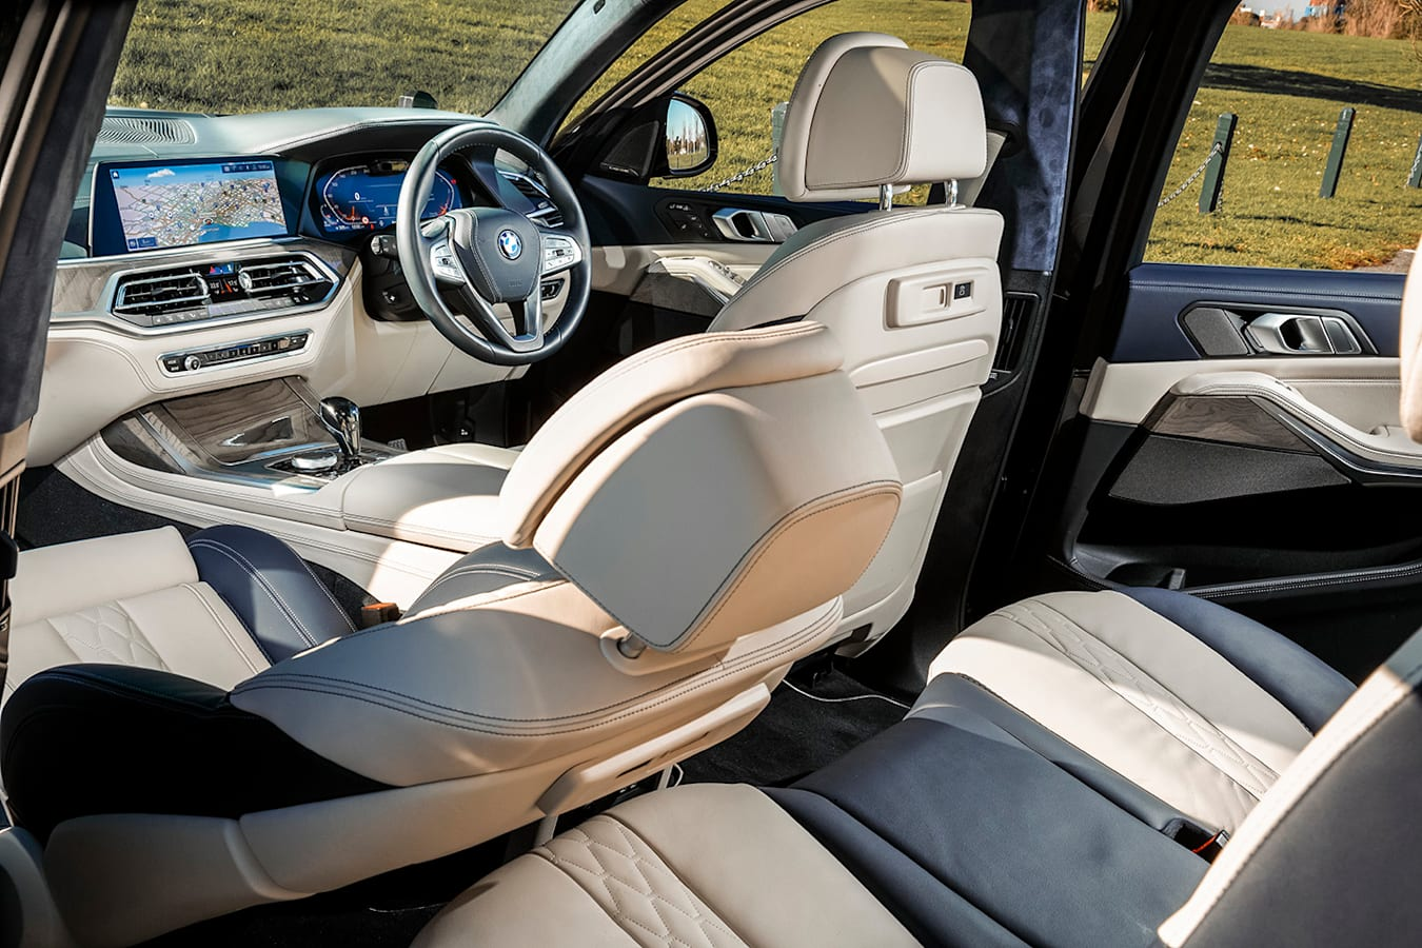 2019 bmw x7 xDrive30d interior